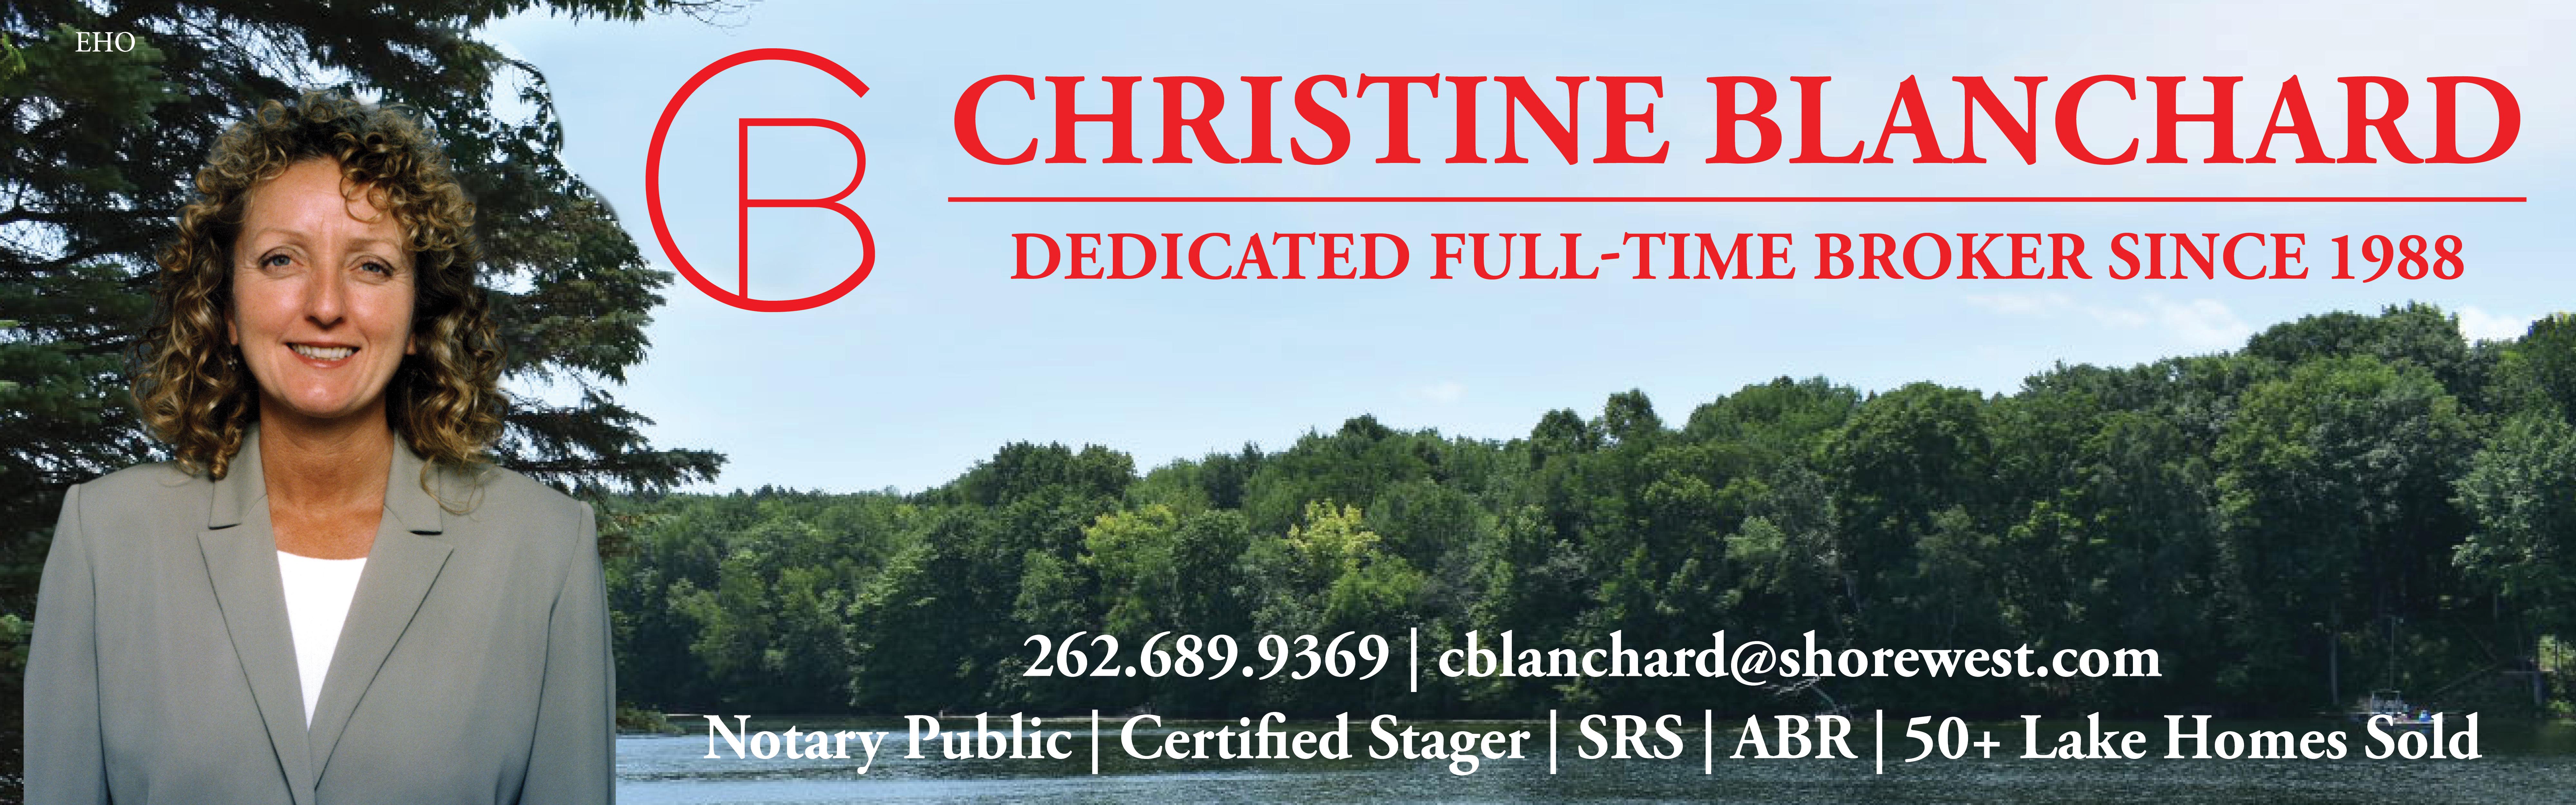 Christine Blanchard